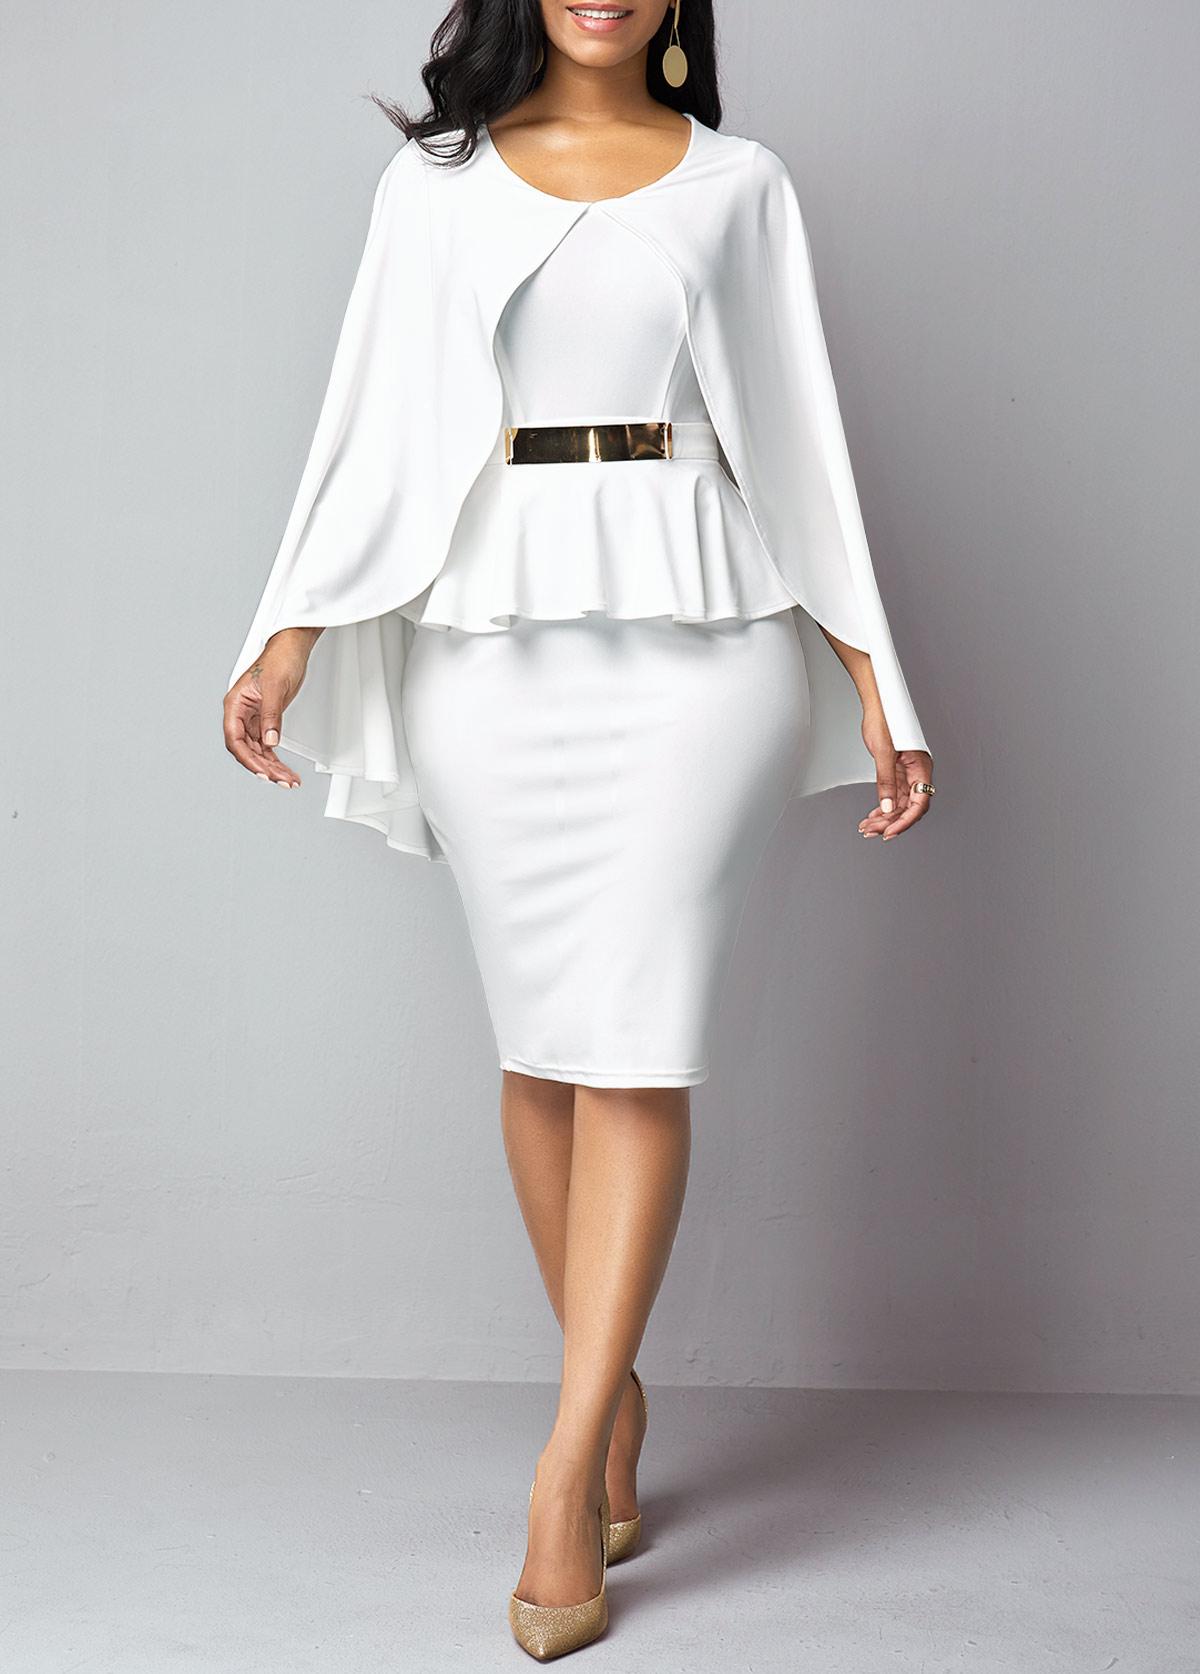 Peplum Waist Overlay Round Neck Dress